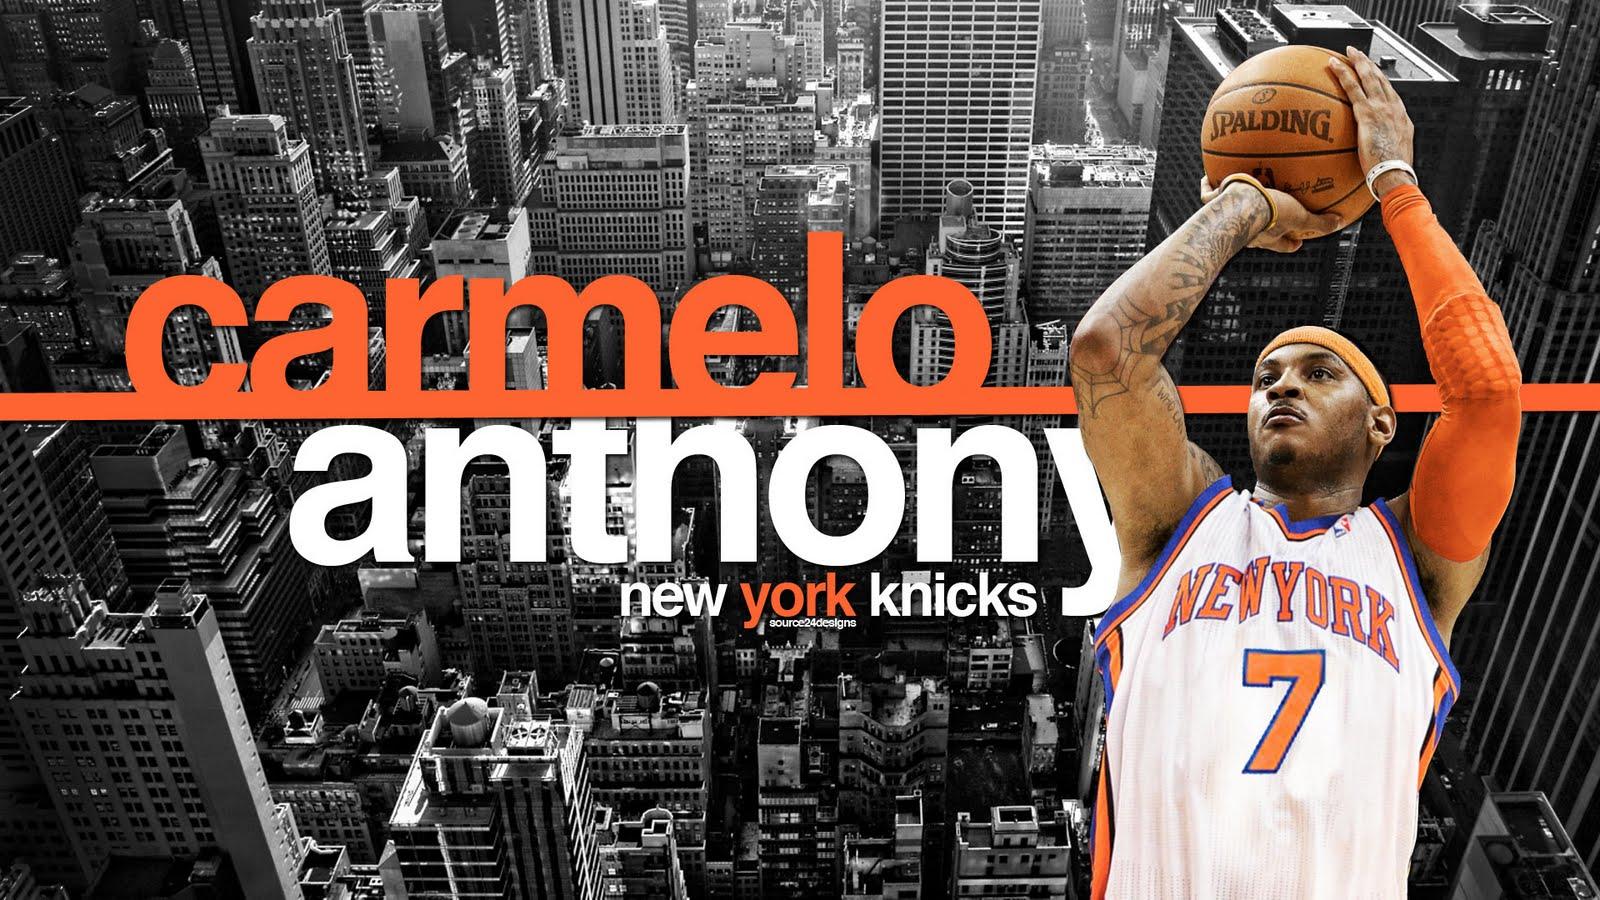 http://1.bp.blogspot.com/-6nUPDtcogE4/TWxDcsyo7NI/AAAAAAAAEOY/-QInD3BDIAw/s1600/Carmelo-Anthony-New-York-Knicks-Widescreen-Wallpaper.jpg